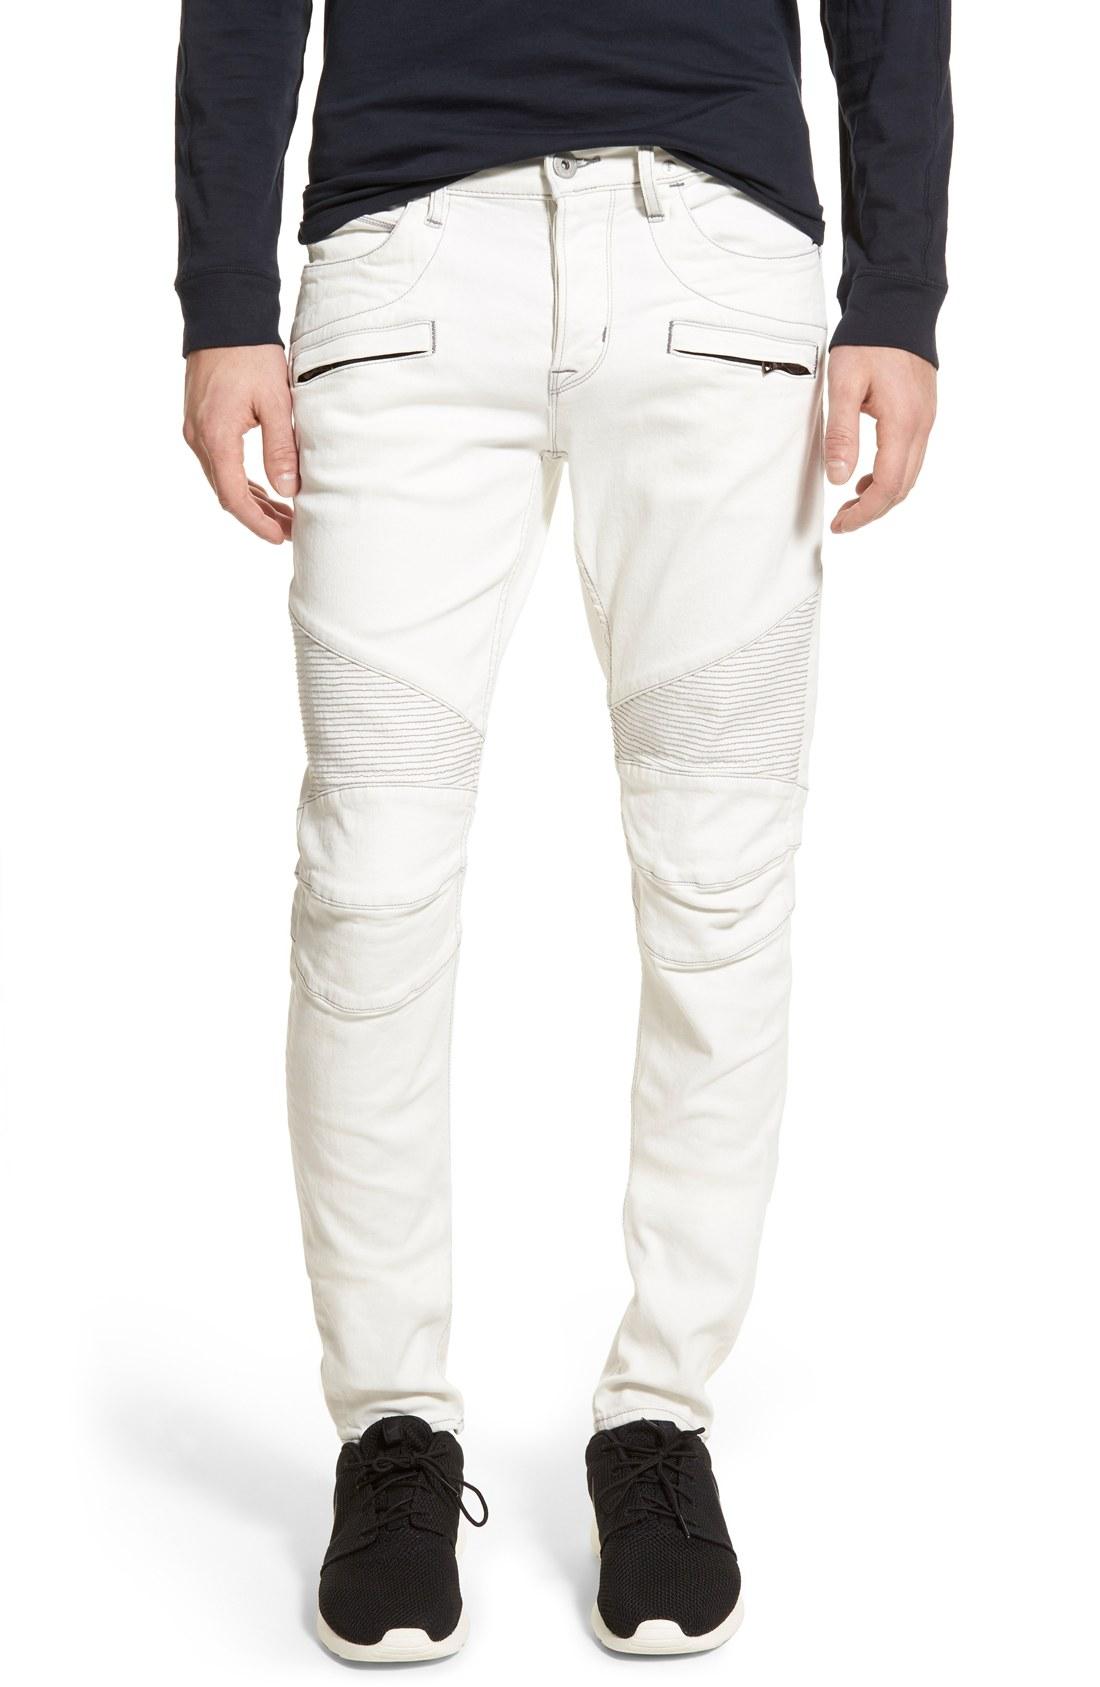 Hudson-Blender-Skinny-Fit-Moto-Jeans-Peroxide-1